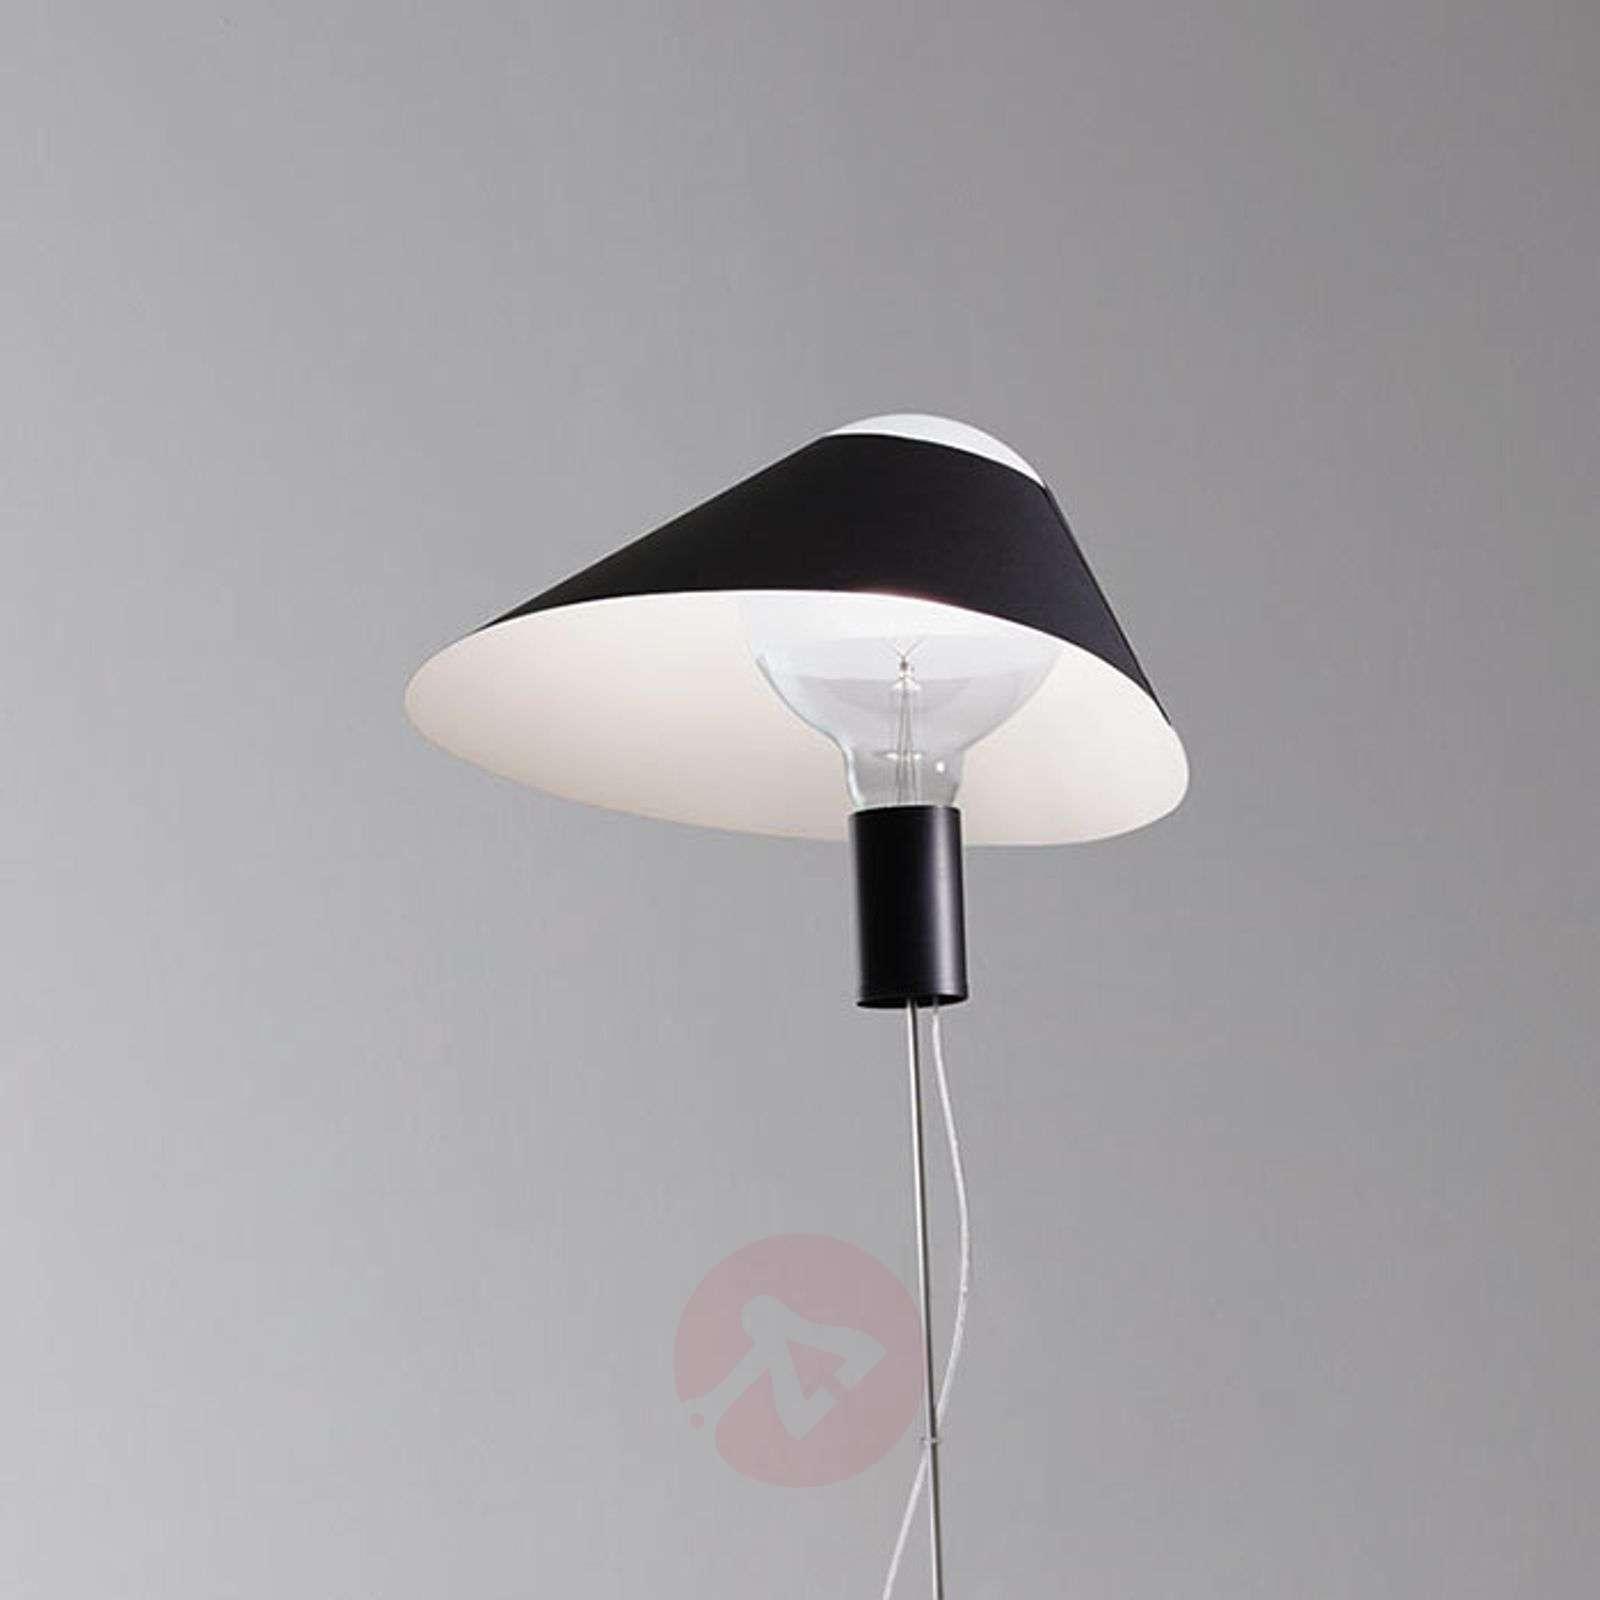 LED floor lamp Glatzkopf with cardboard lampshade-5026116X-01